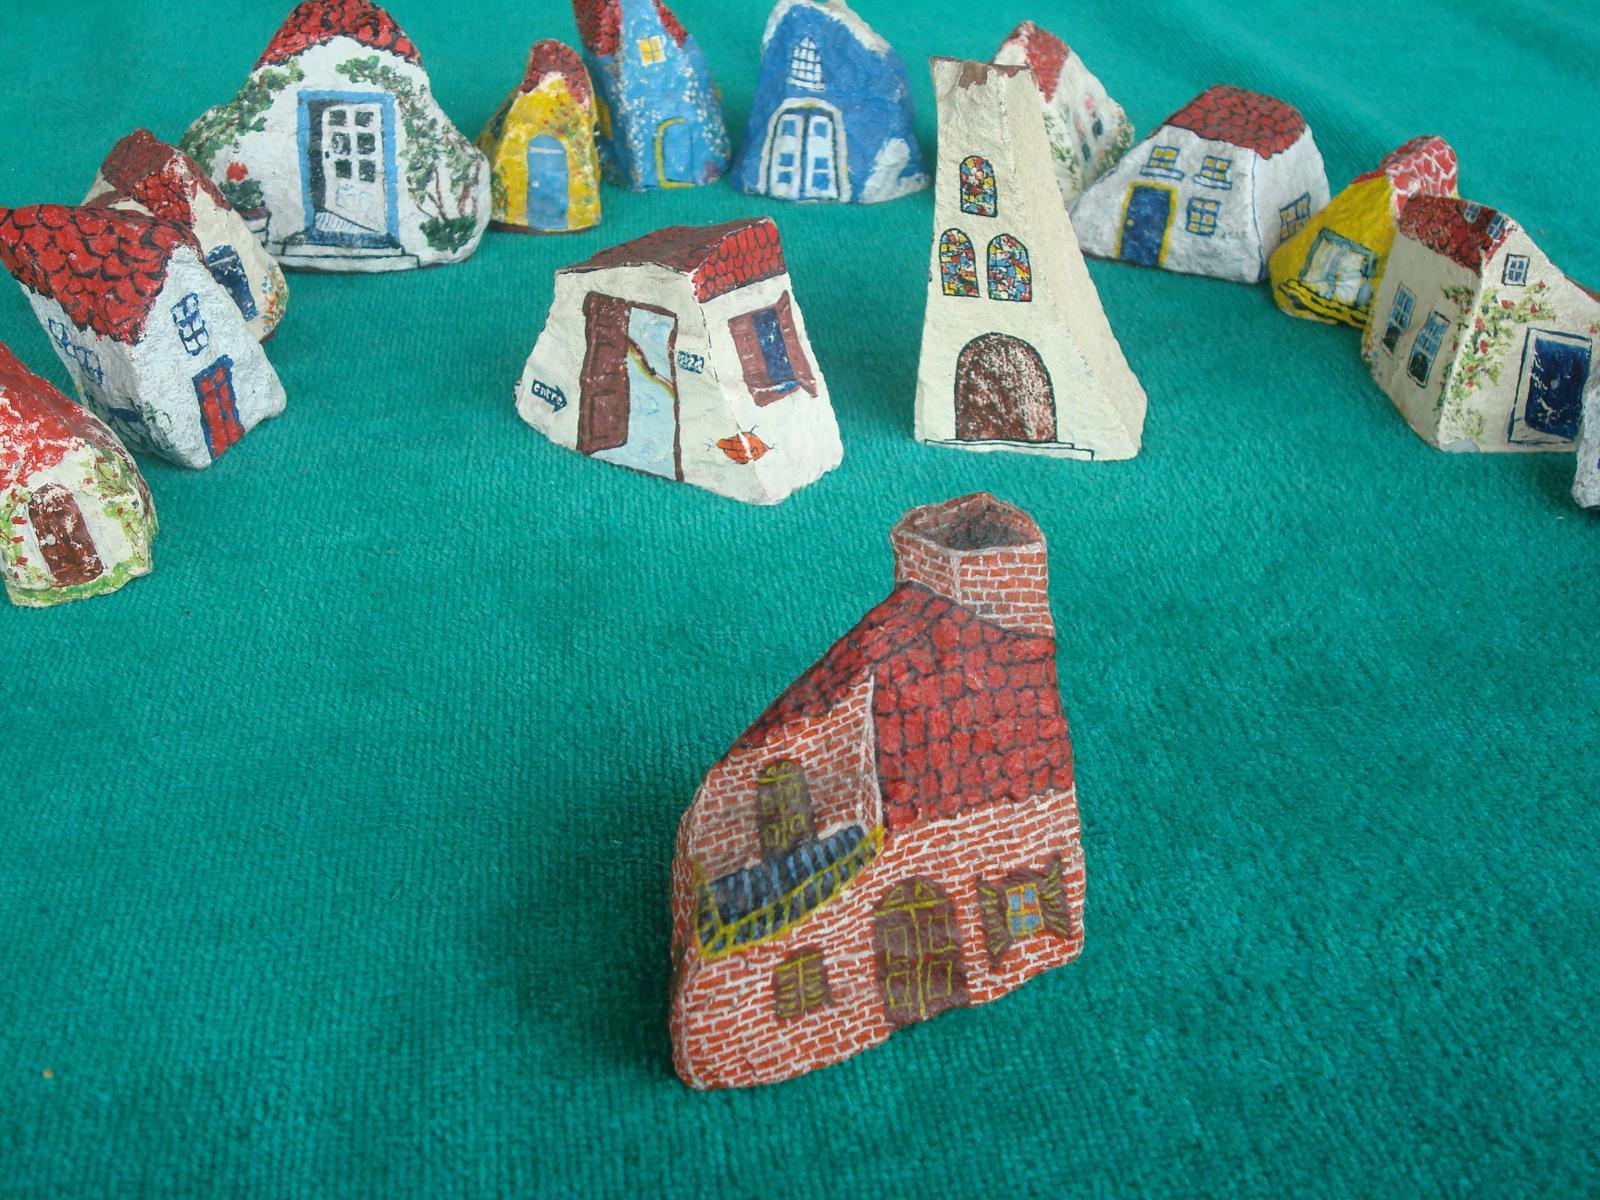 Casas de Pedras